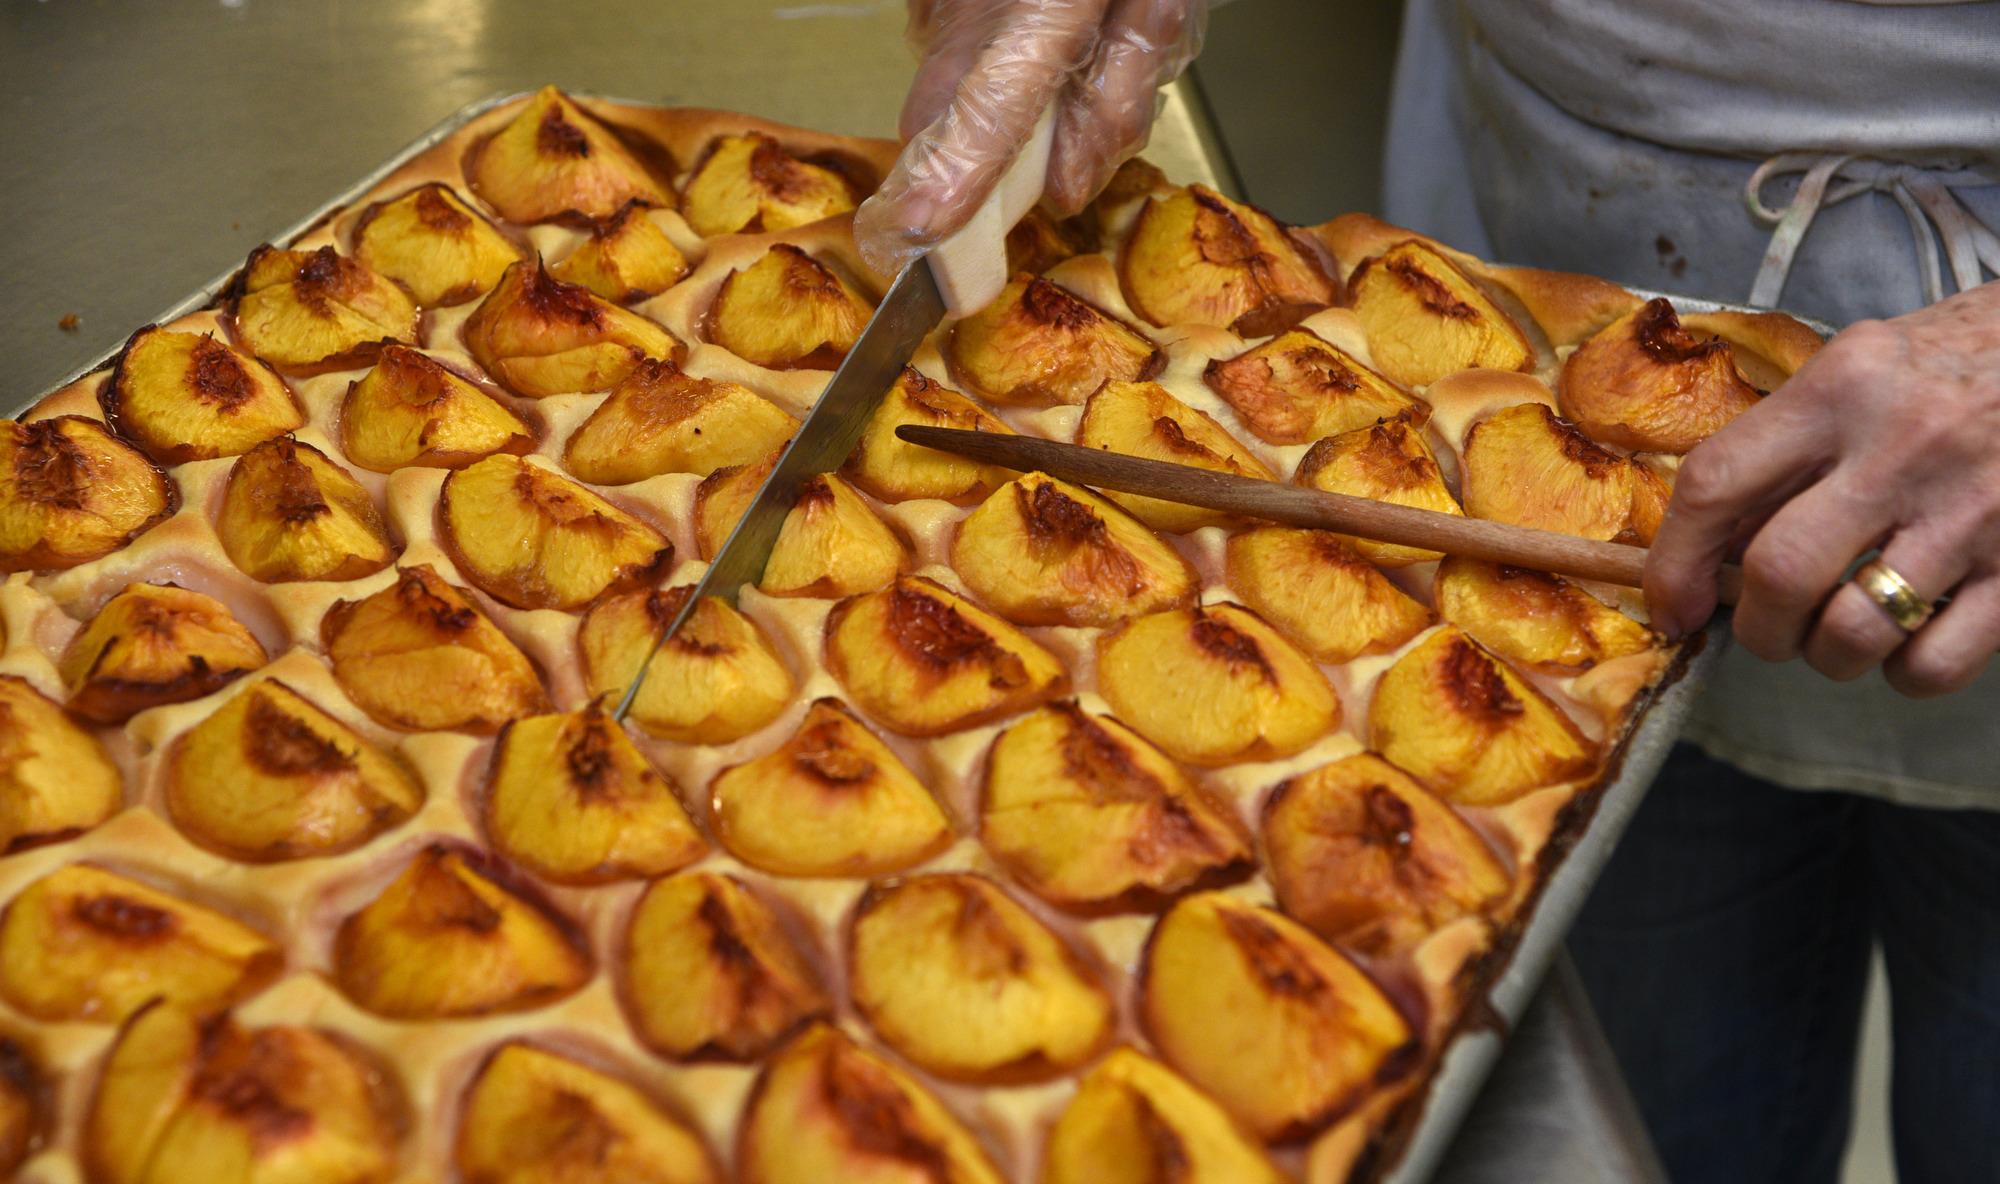 Baltimore Peach Cake at the Fenwick Bakery